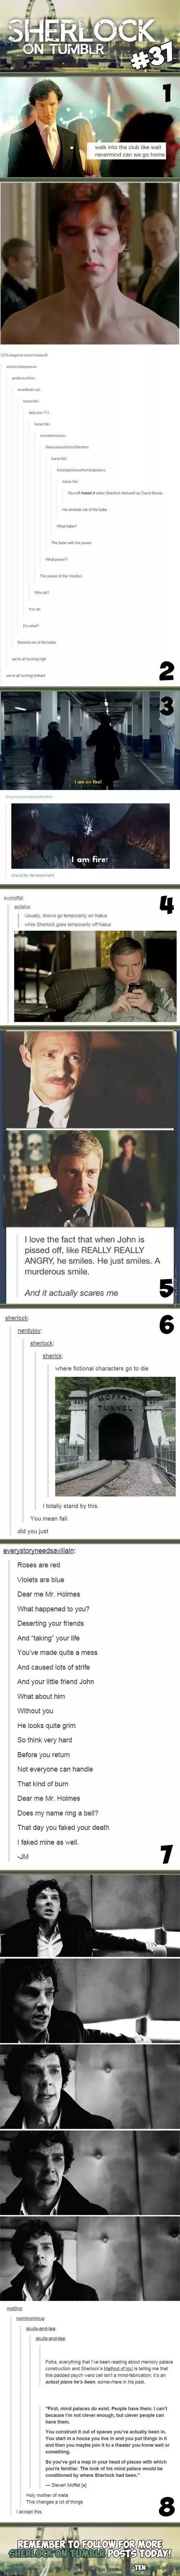 Sherlock On Tumblr #37 #IAmAGeek